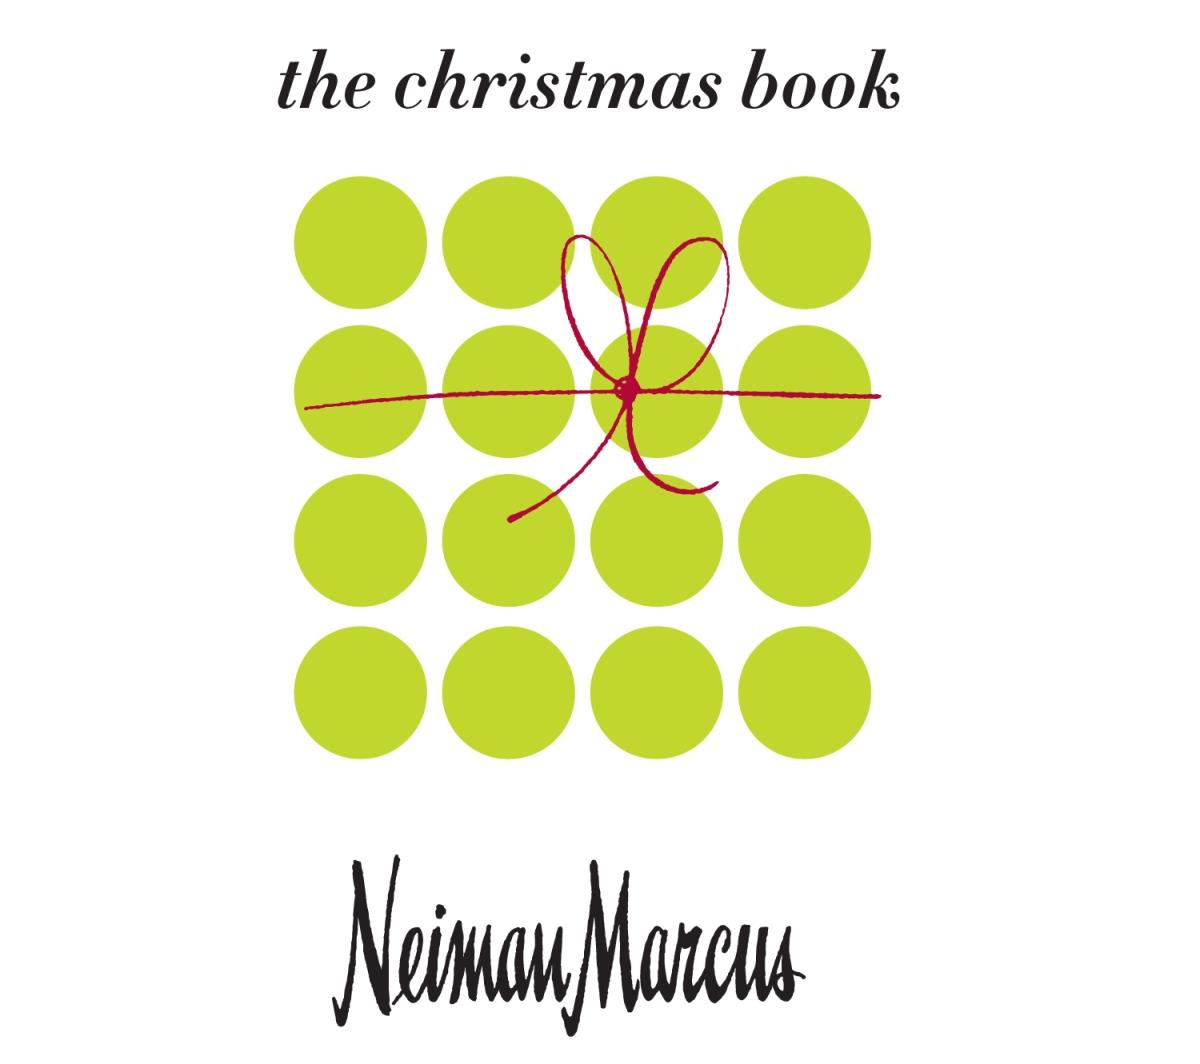 2012 neiman marcus christmas book cover. Black Bedroom Furniture Sets. Home Design Ideas